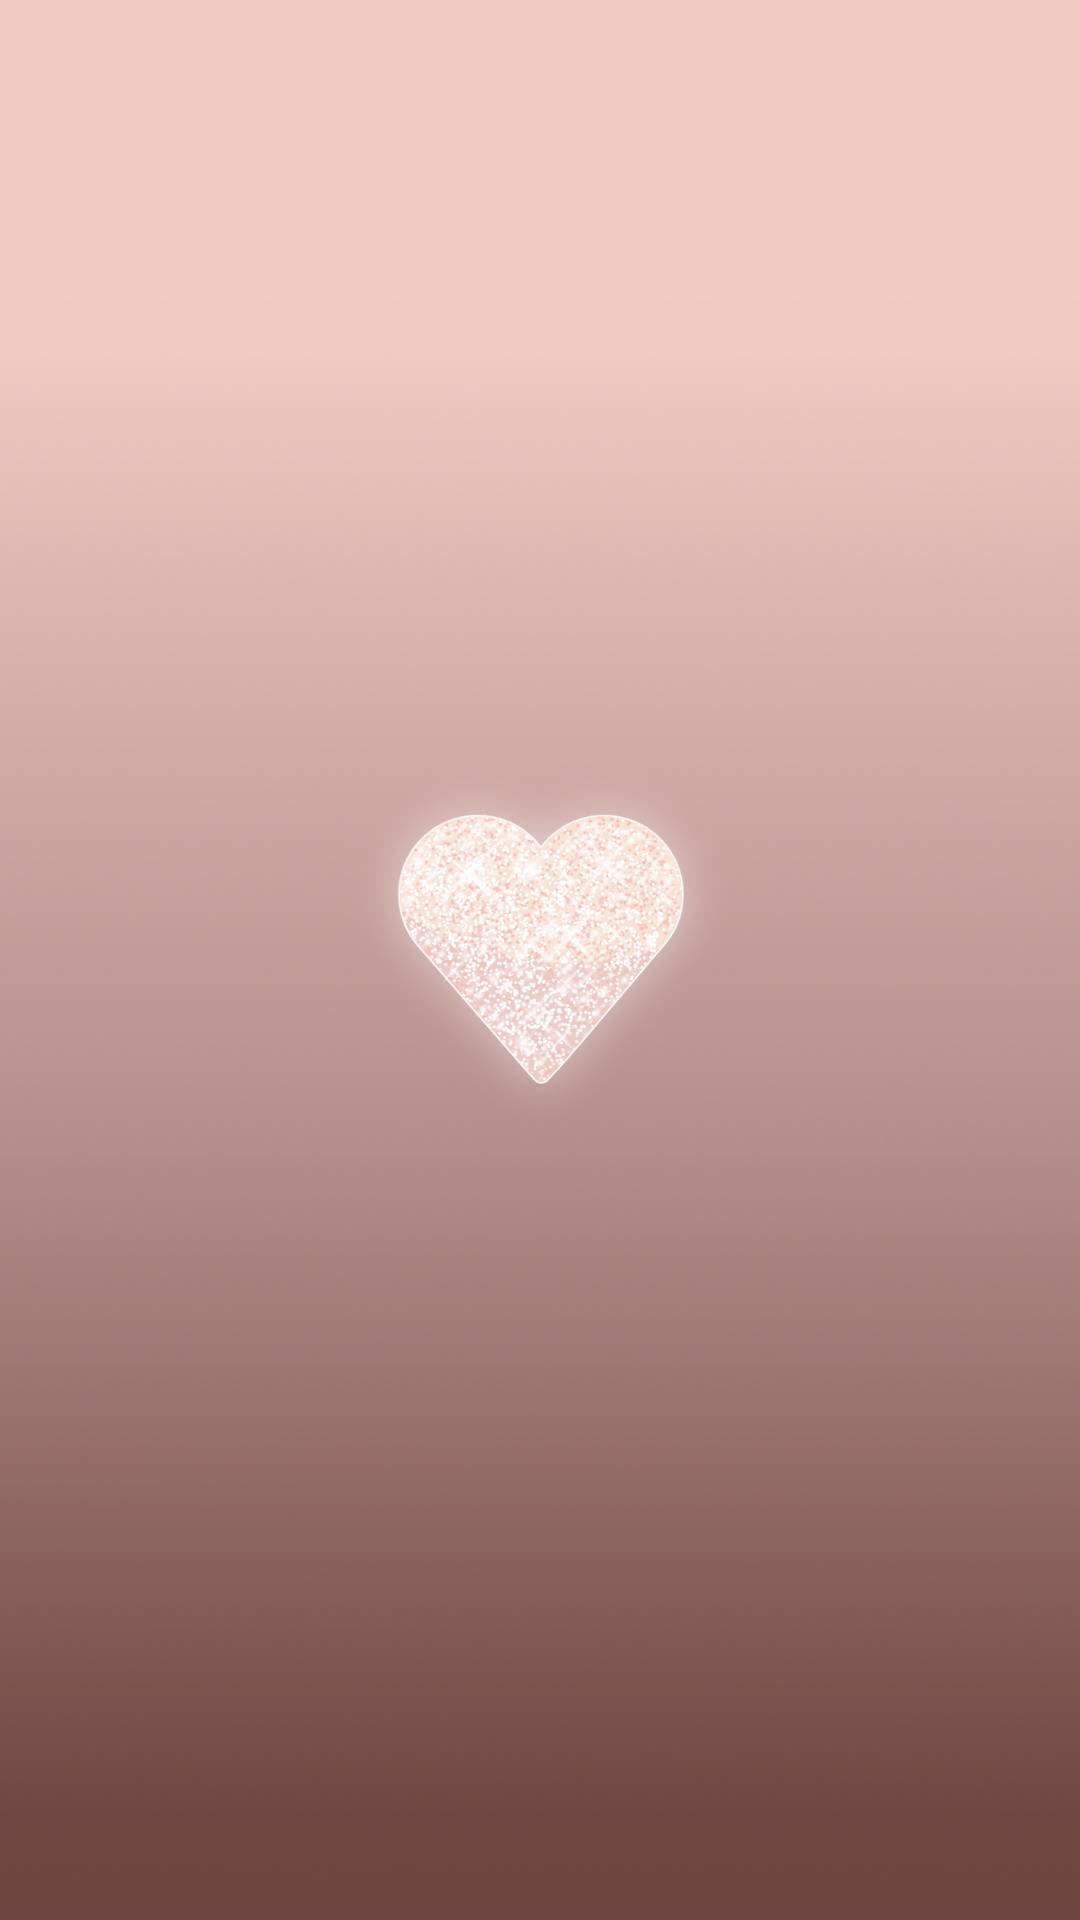 Rose Gold Heart Gold Wallpaper Iphone Rose Gold Backgrounds Rose Gold Wallpaper